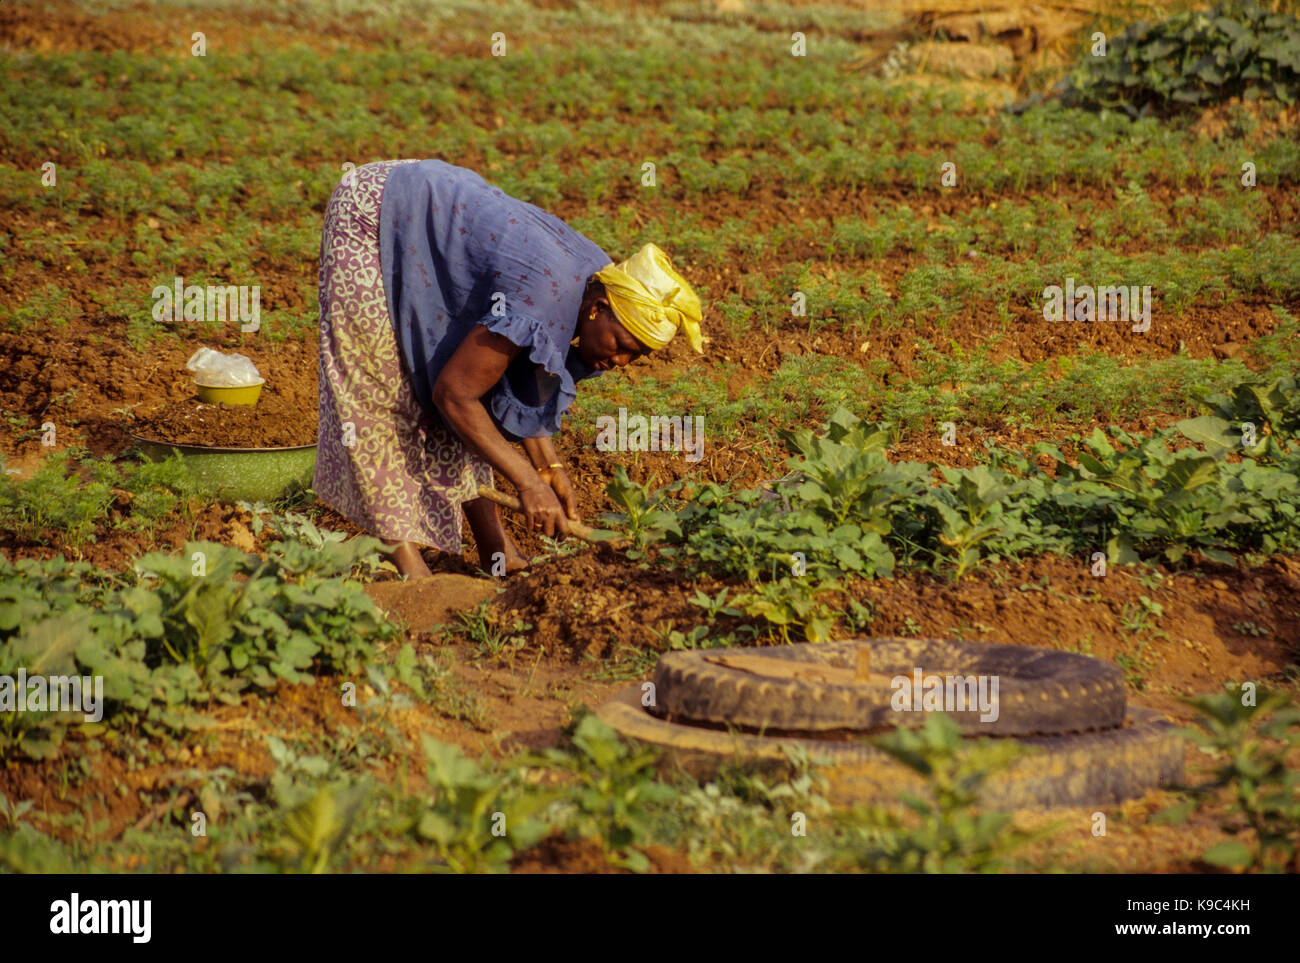 Korhogo, Ivory Coast, Cote d'Ivoire.  Senoufo Woman Tending her Garden Plot. - Stock Image